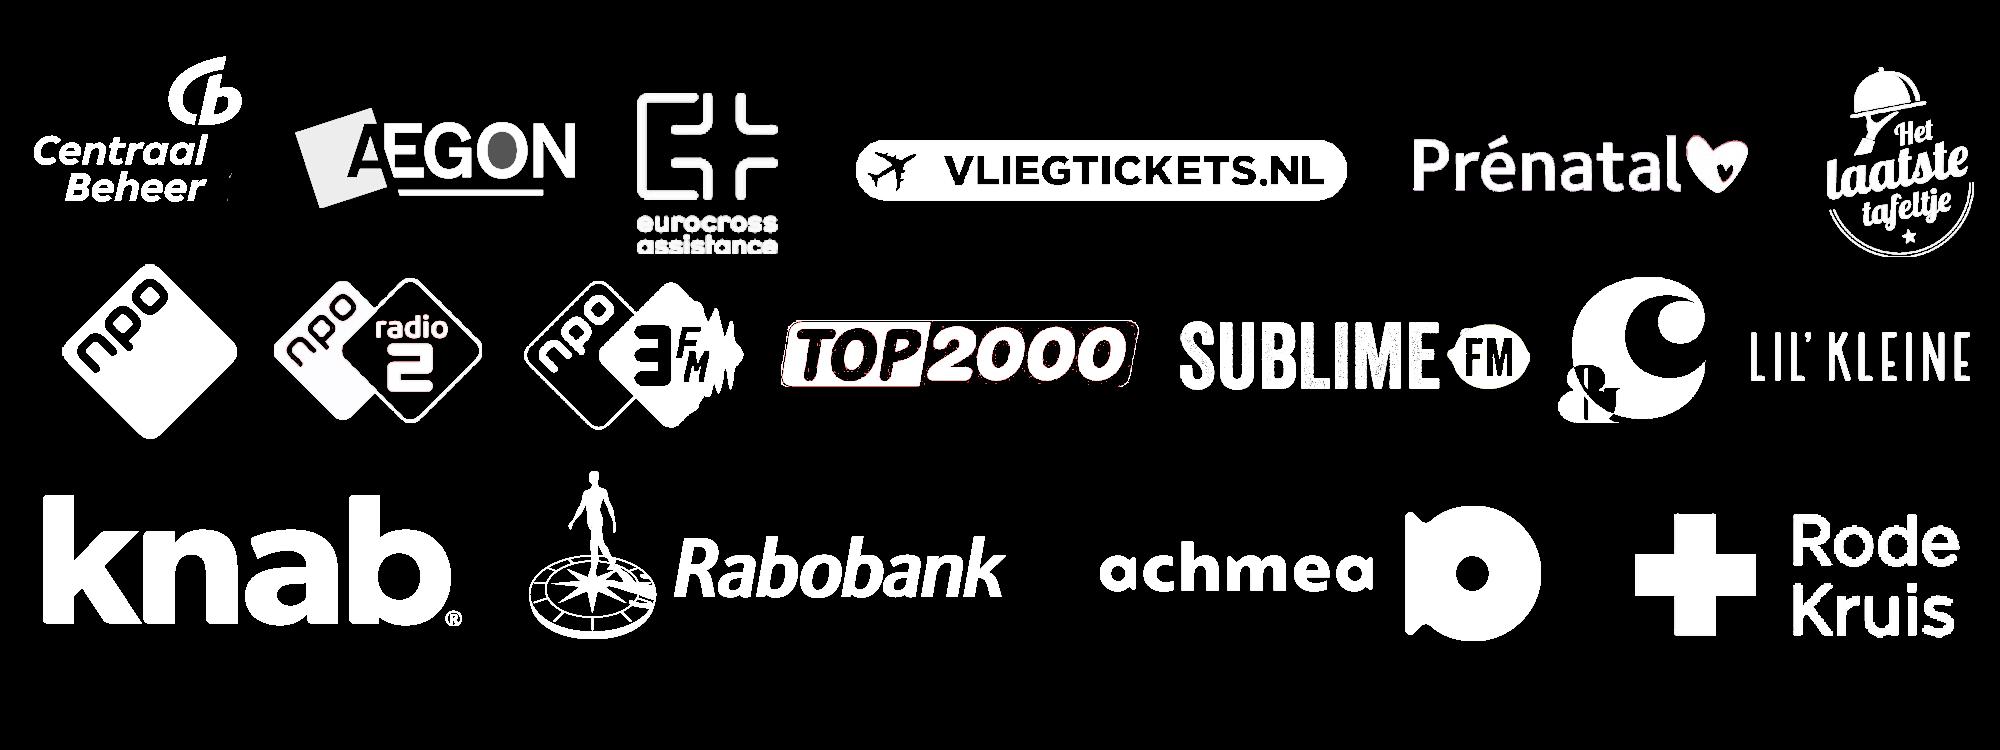 icoon-logo-wit